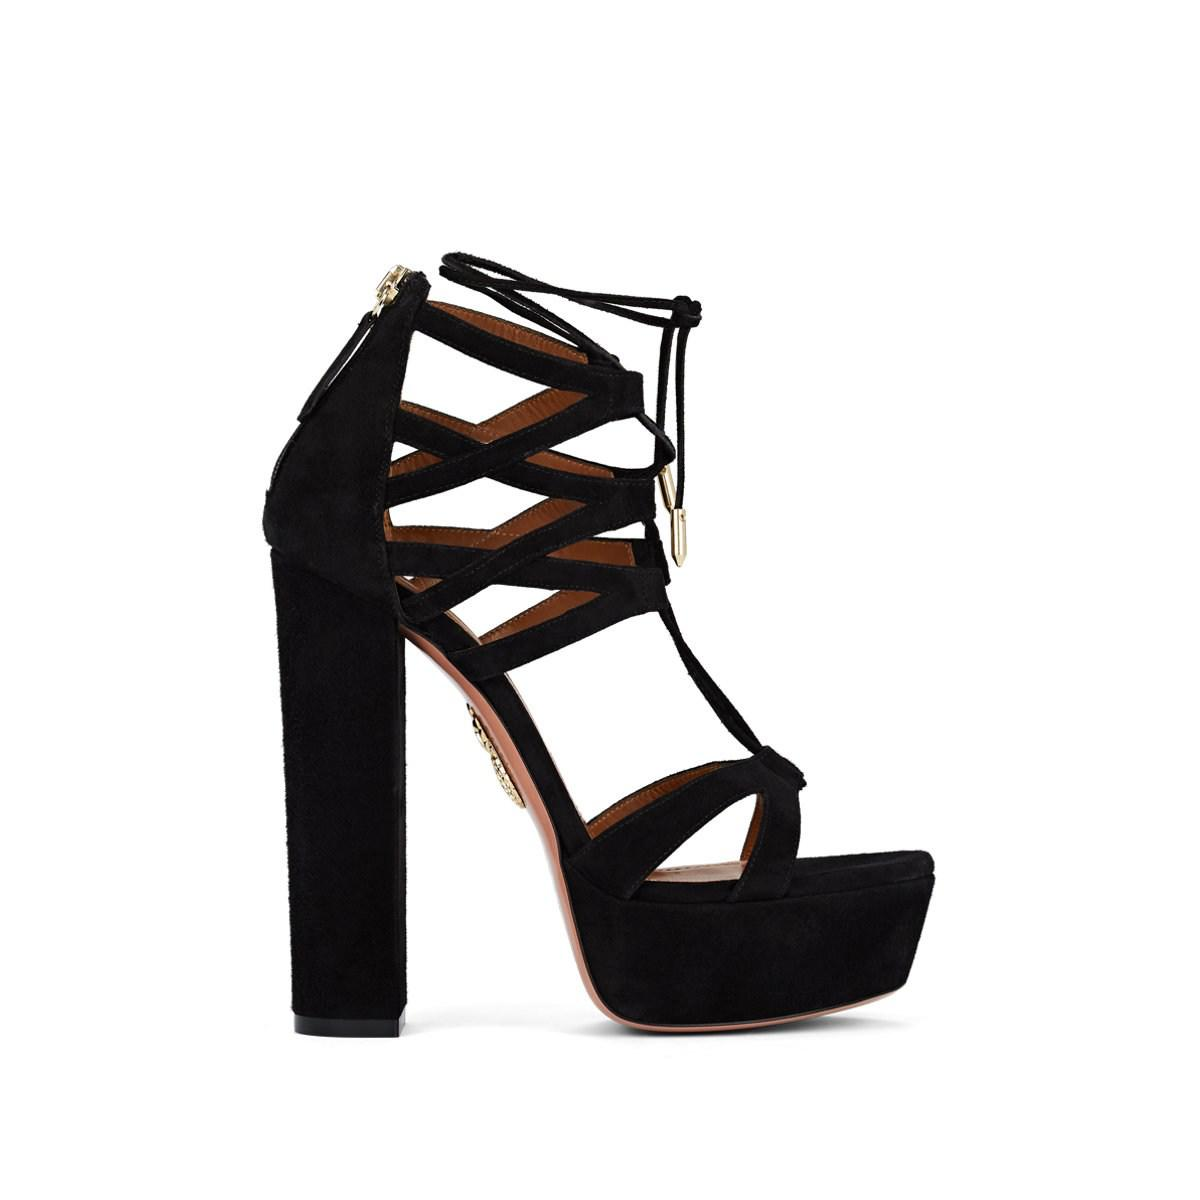 b71995948439 Lyst - Aquazzura Beverly Hills Suede Ankle-tie Platform Sandals in Black